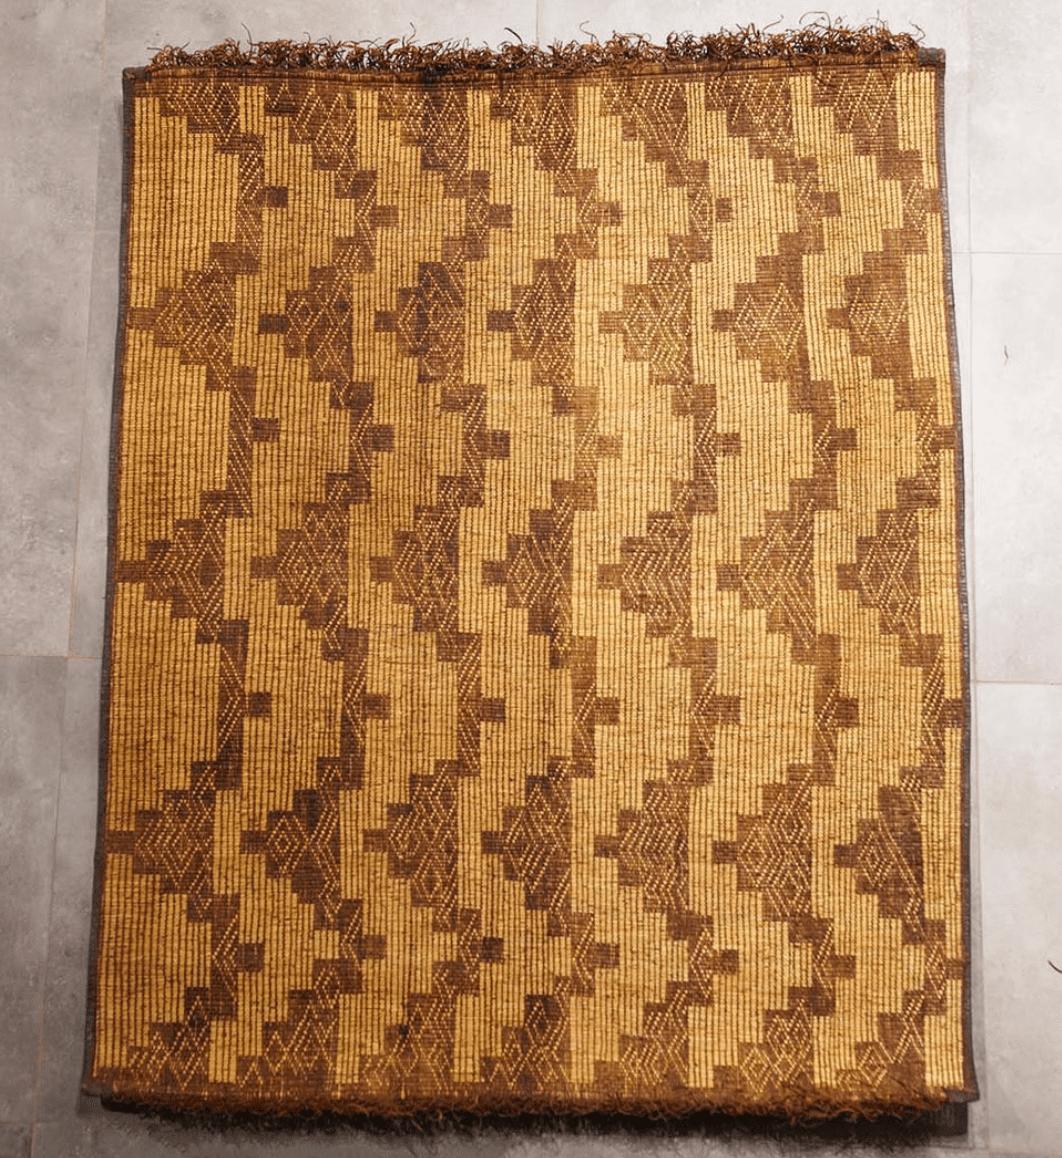 Vintage Tuareg Mat 4.65ft x 3.77ft - Moroccan Vintage Reed Mats - Masina